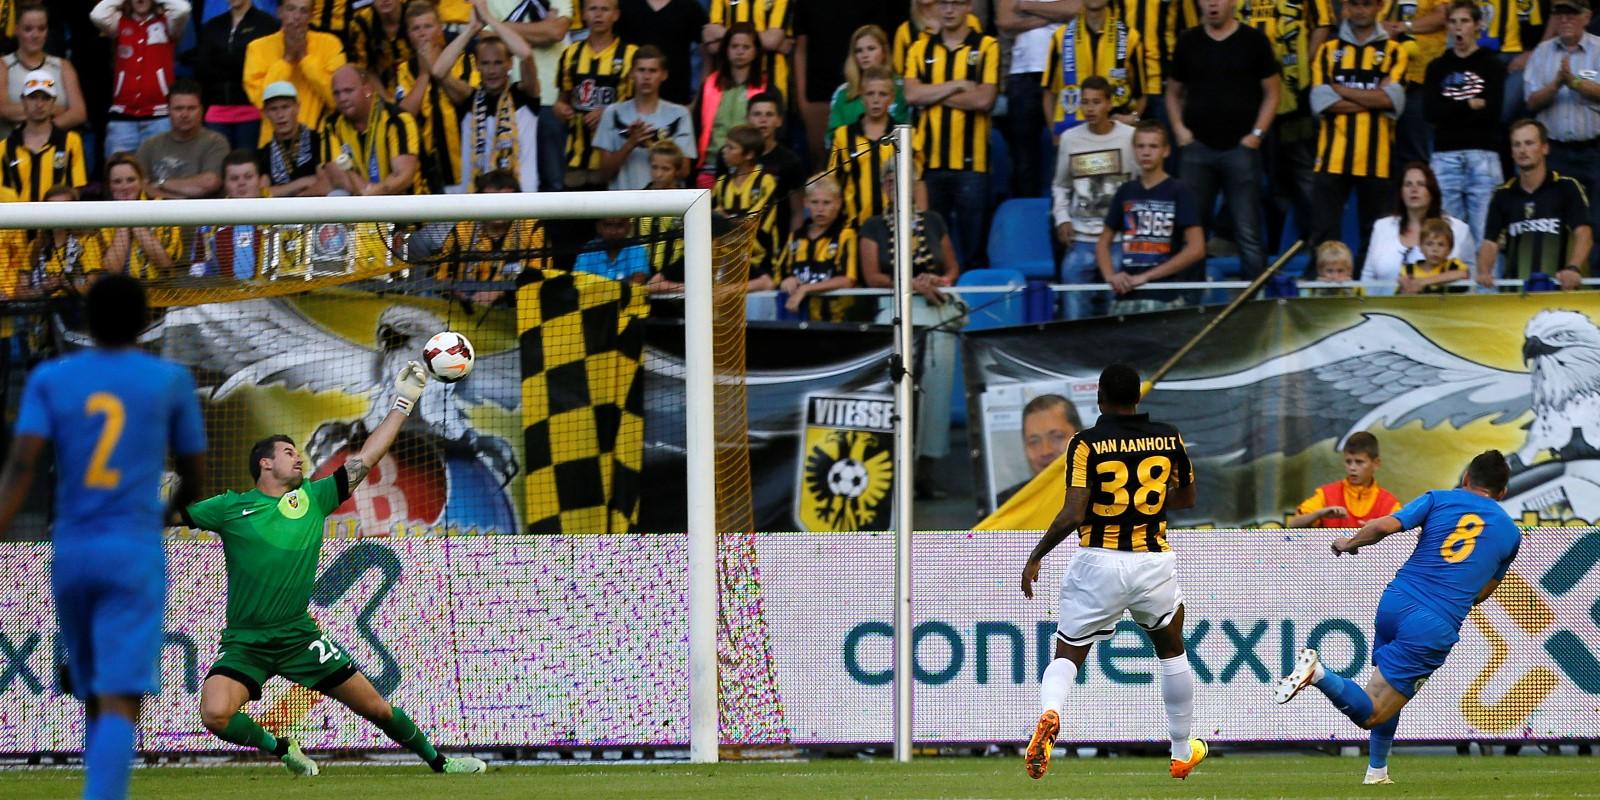 Ook Vitesse verlaat Europees strijdtoneel al snel